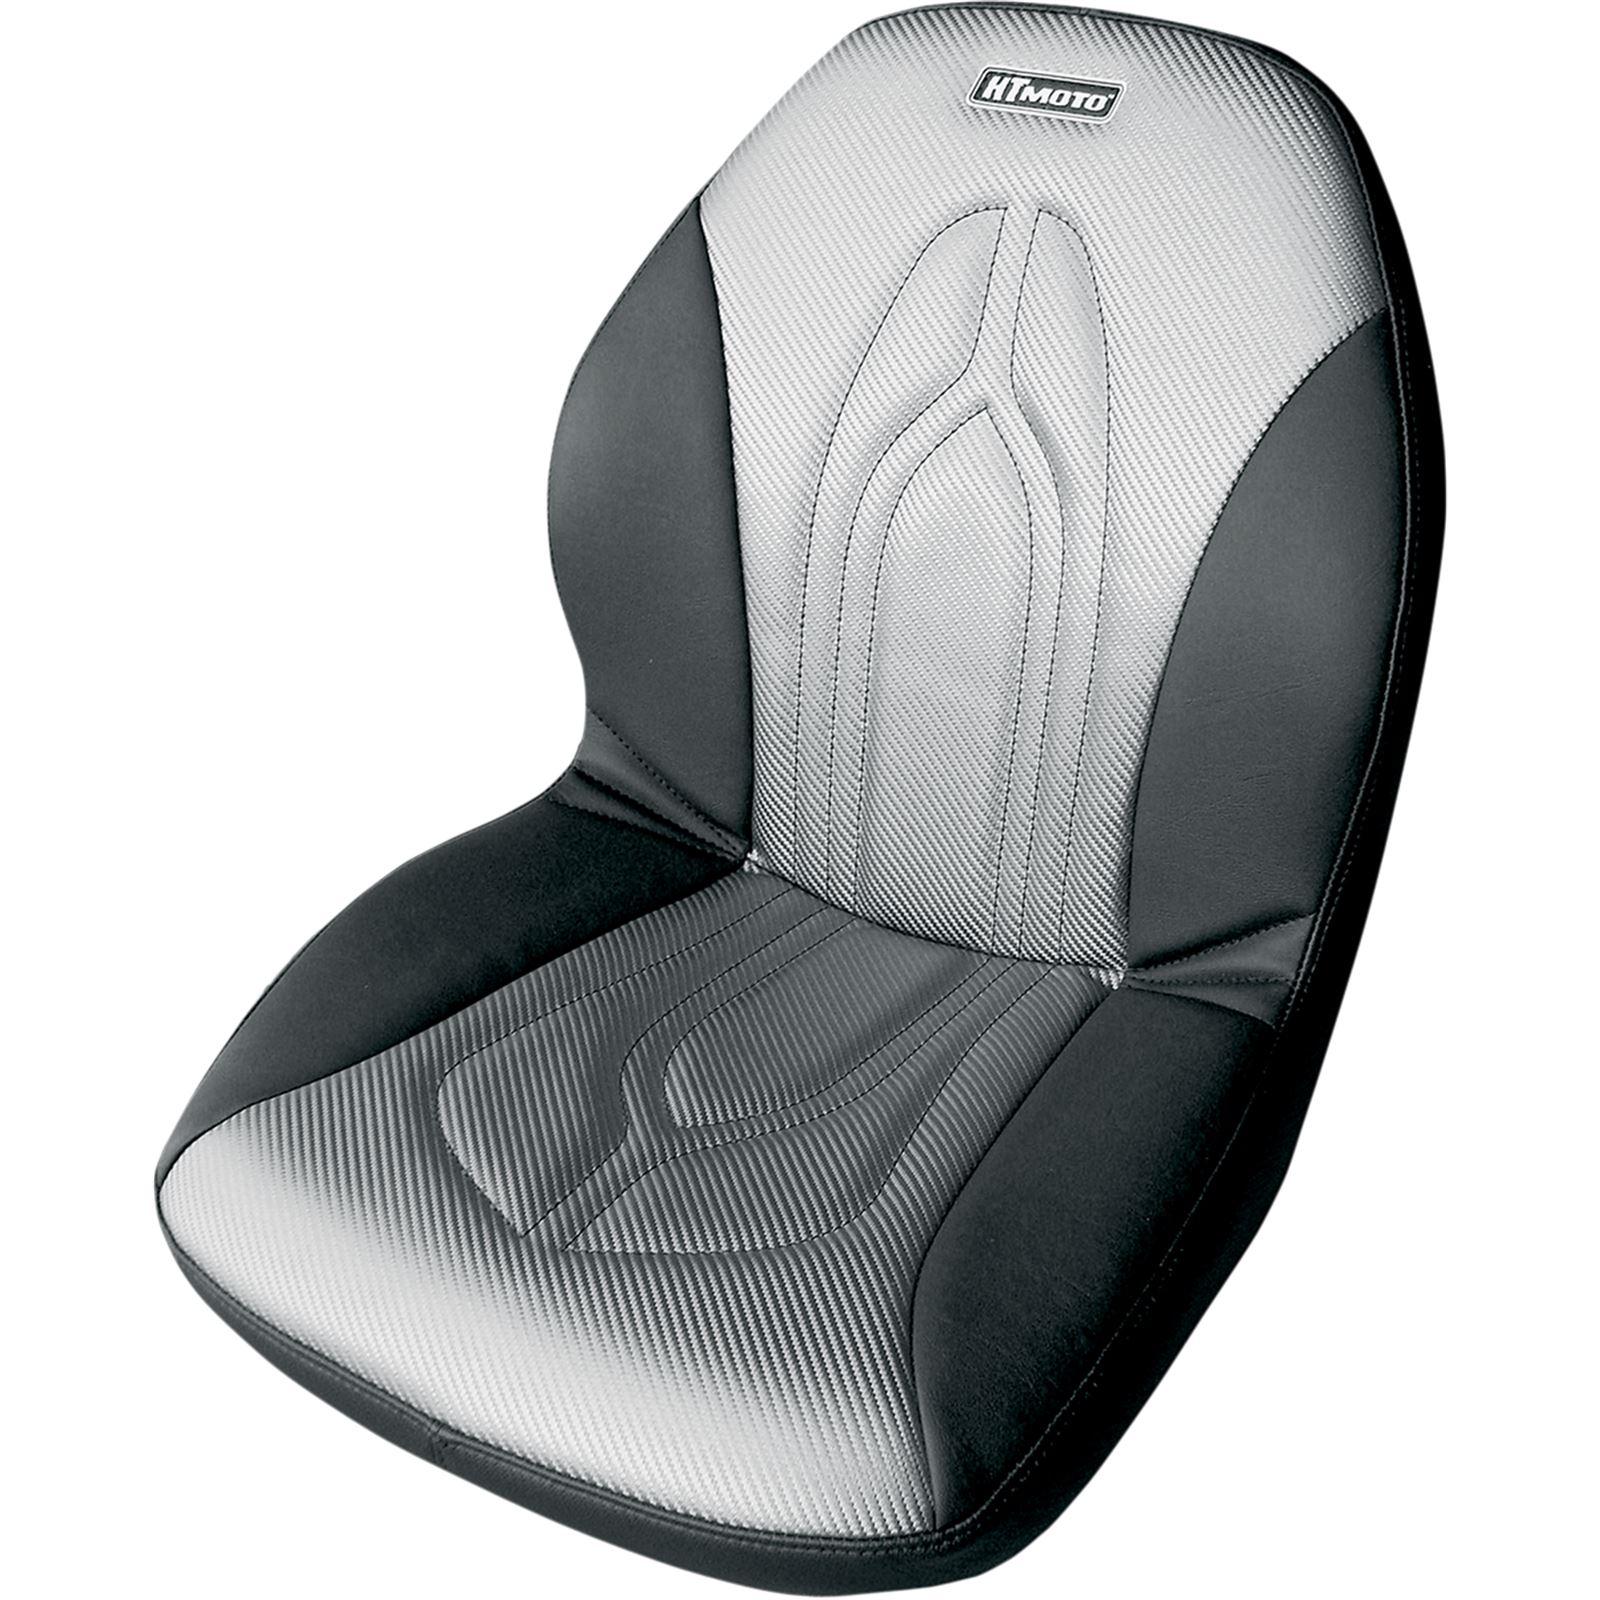 HT Moto Seat Cover - Black/Gray - Arctic Cat